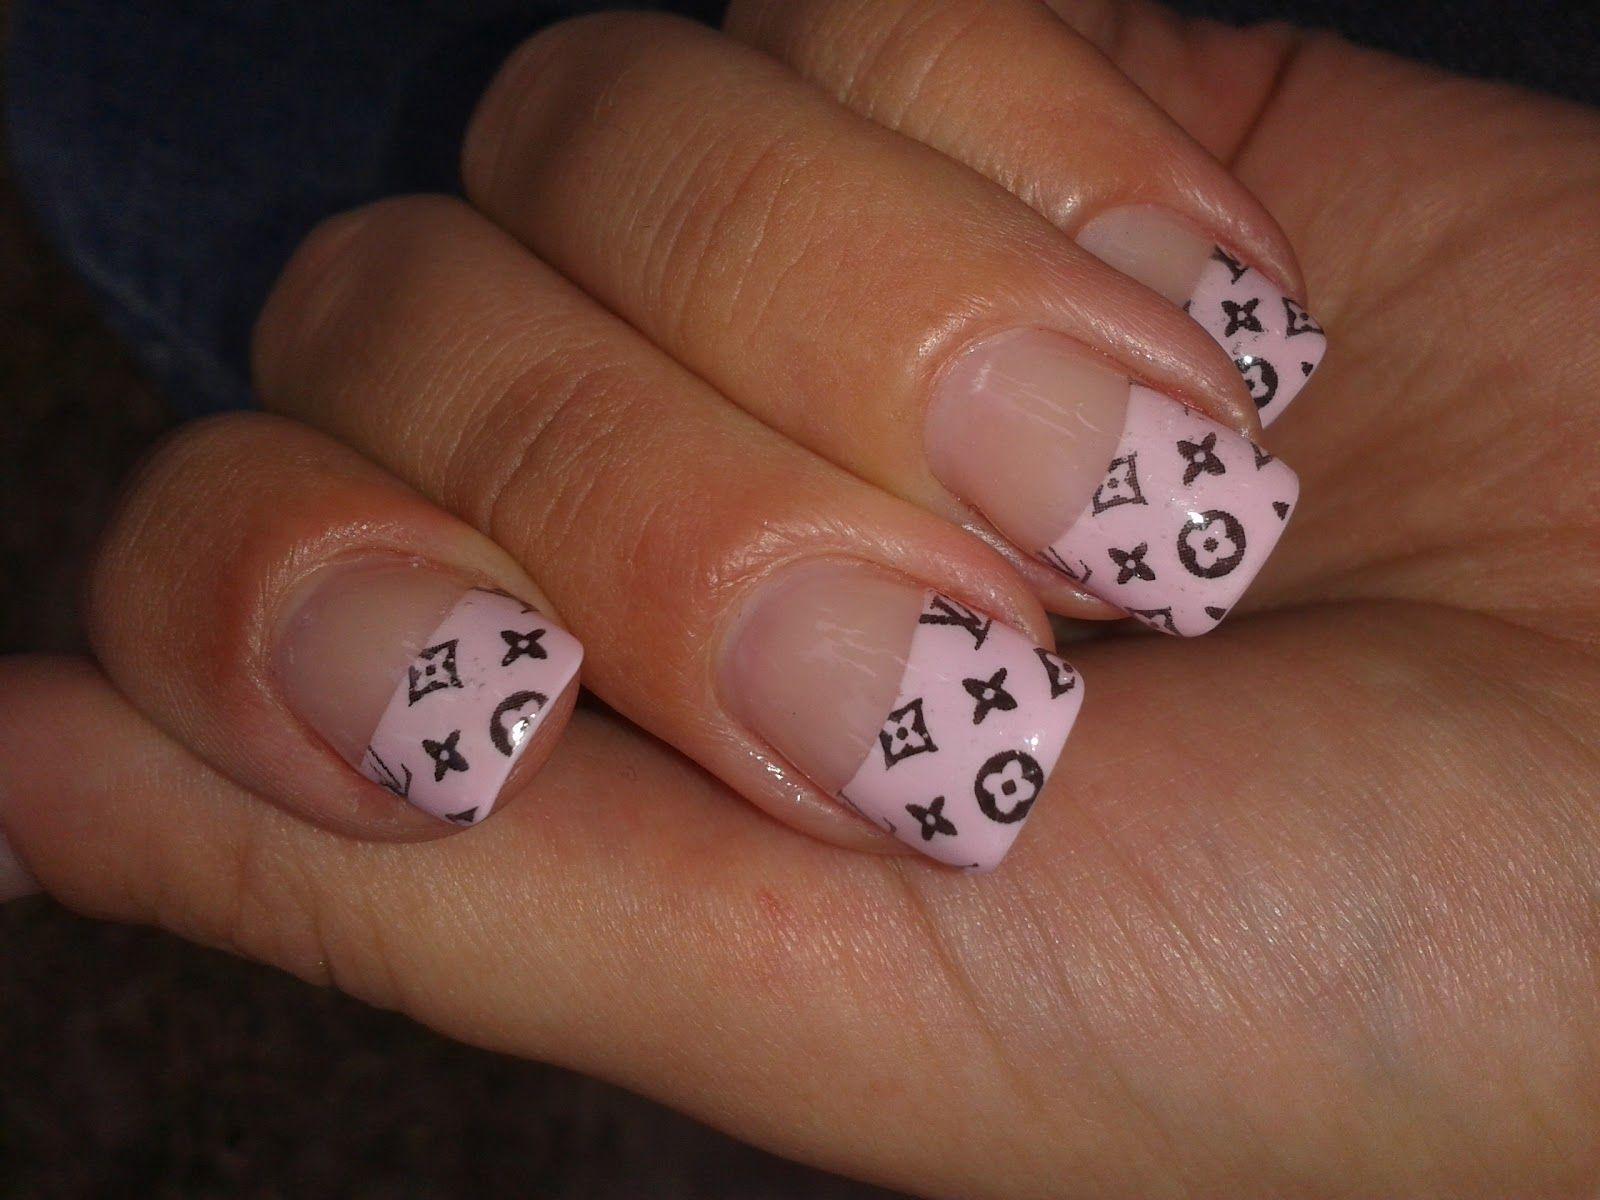 Attractive Louis Vuitton Nail Tips Frieze - Nail Art Ideas ...